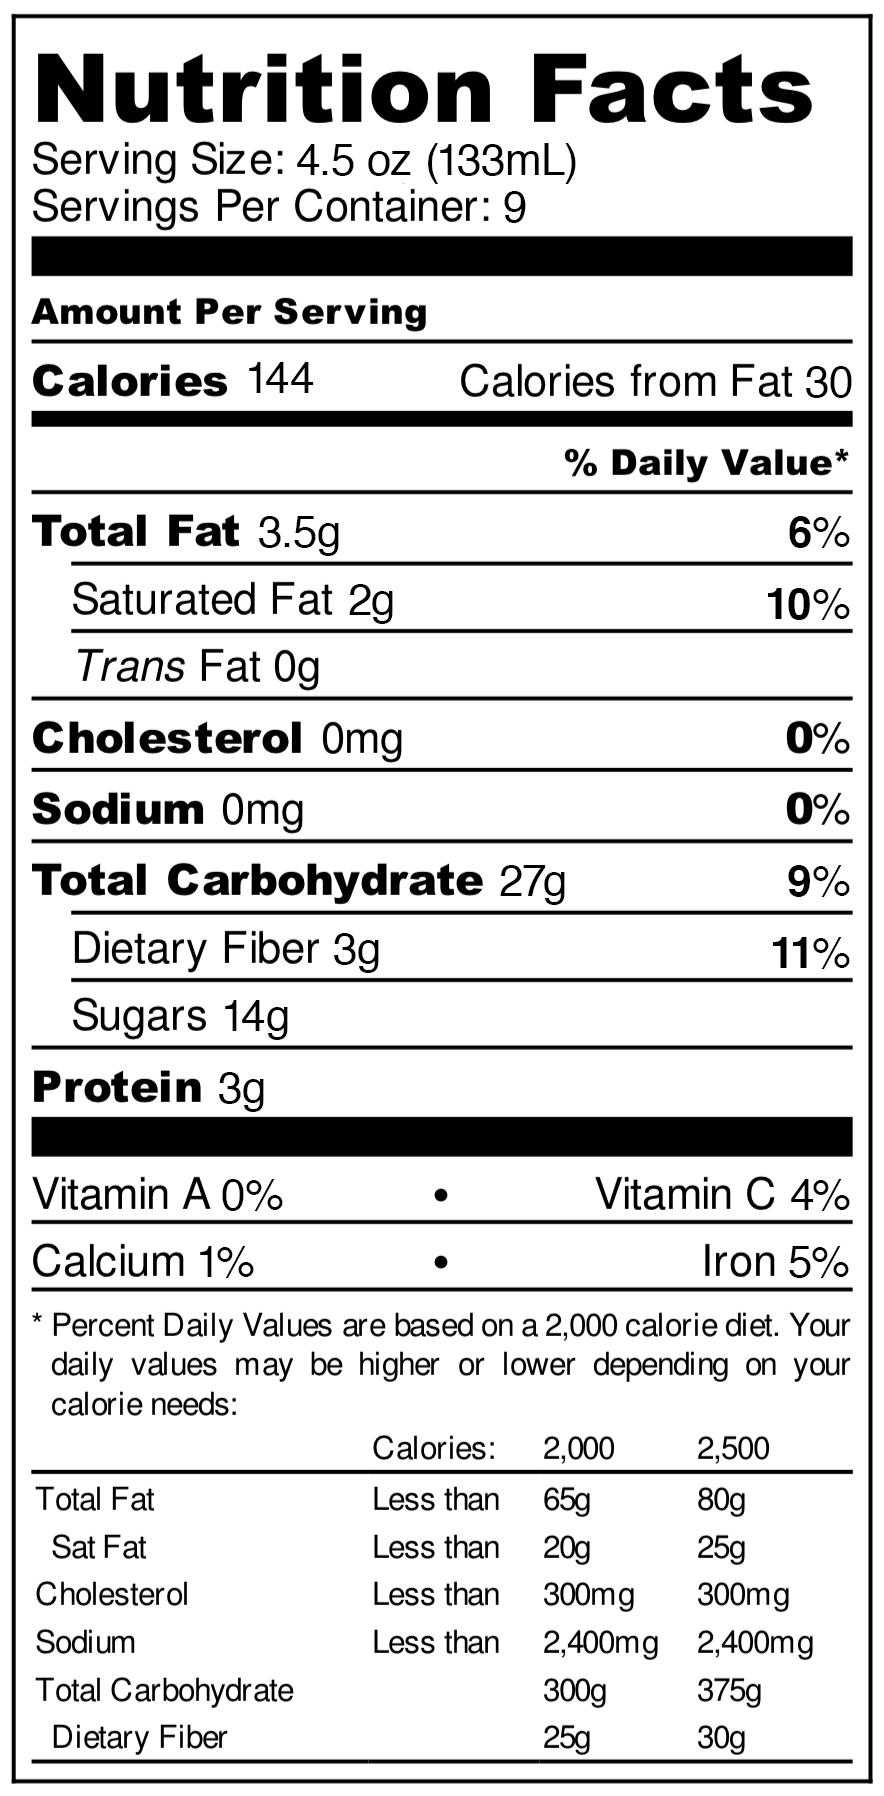 Ingredients: Organic Apples, Gluten Free Steel-cut Oats, Organic Bananas, Organic Raw Honey, Organic Cane Sugar, Organic Coconut Oil, Organic Cinnamon, Purified Water